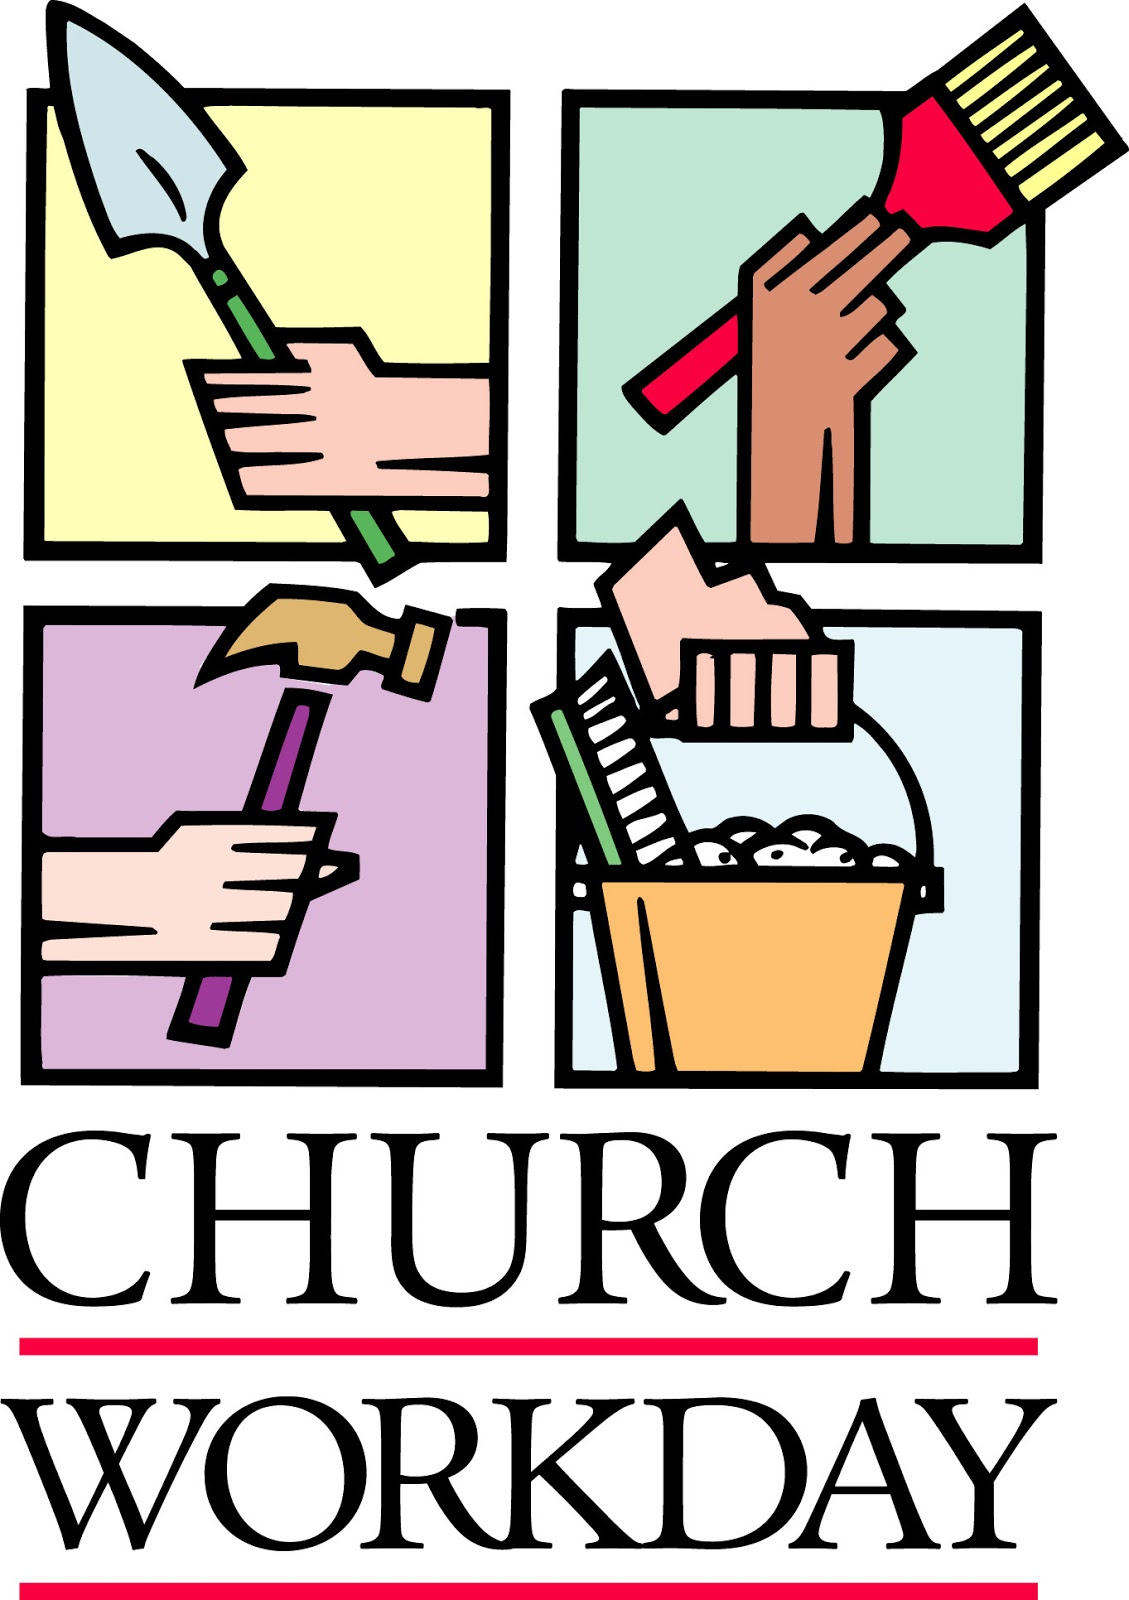 TRUSTWORTHY SAYINGS: Many hands make light work - Church work day ...